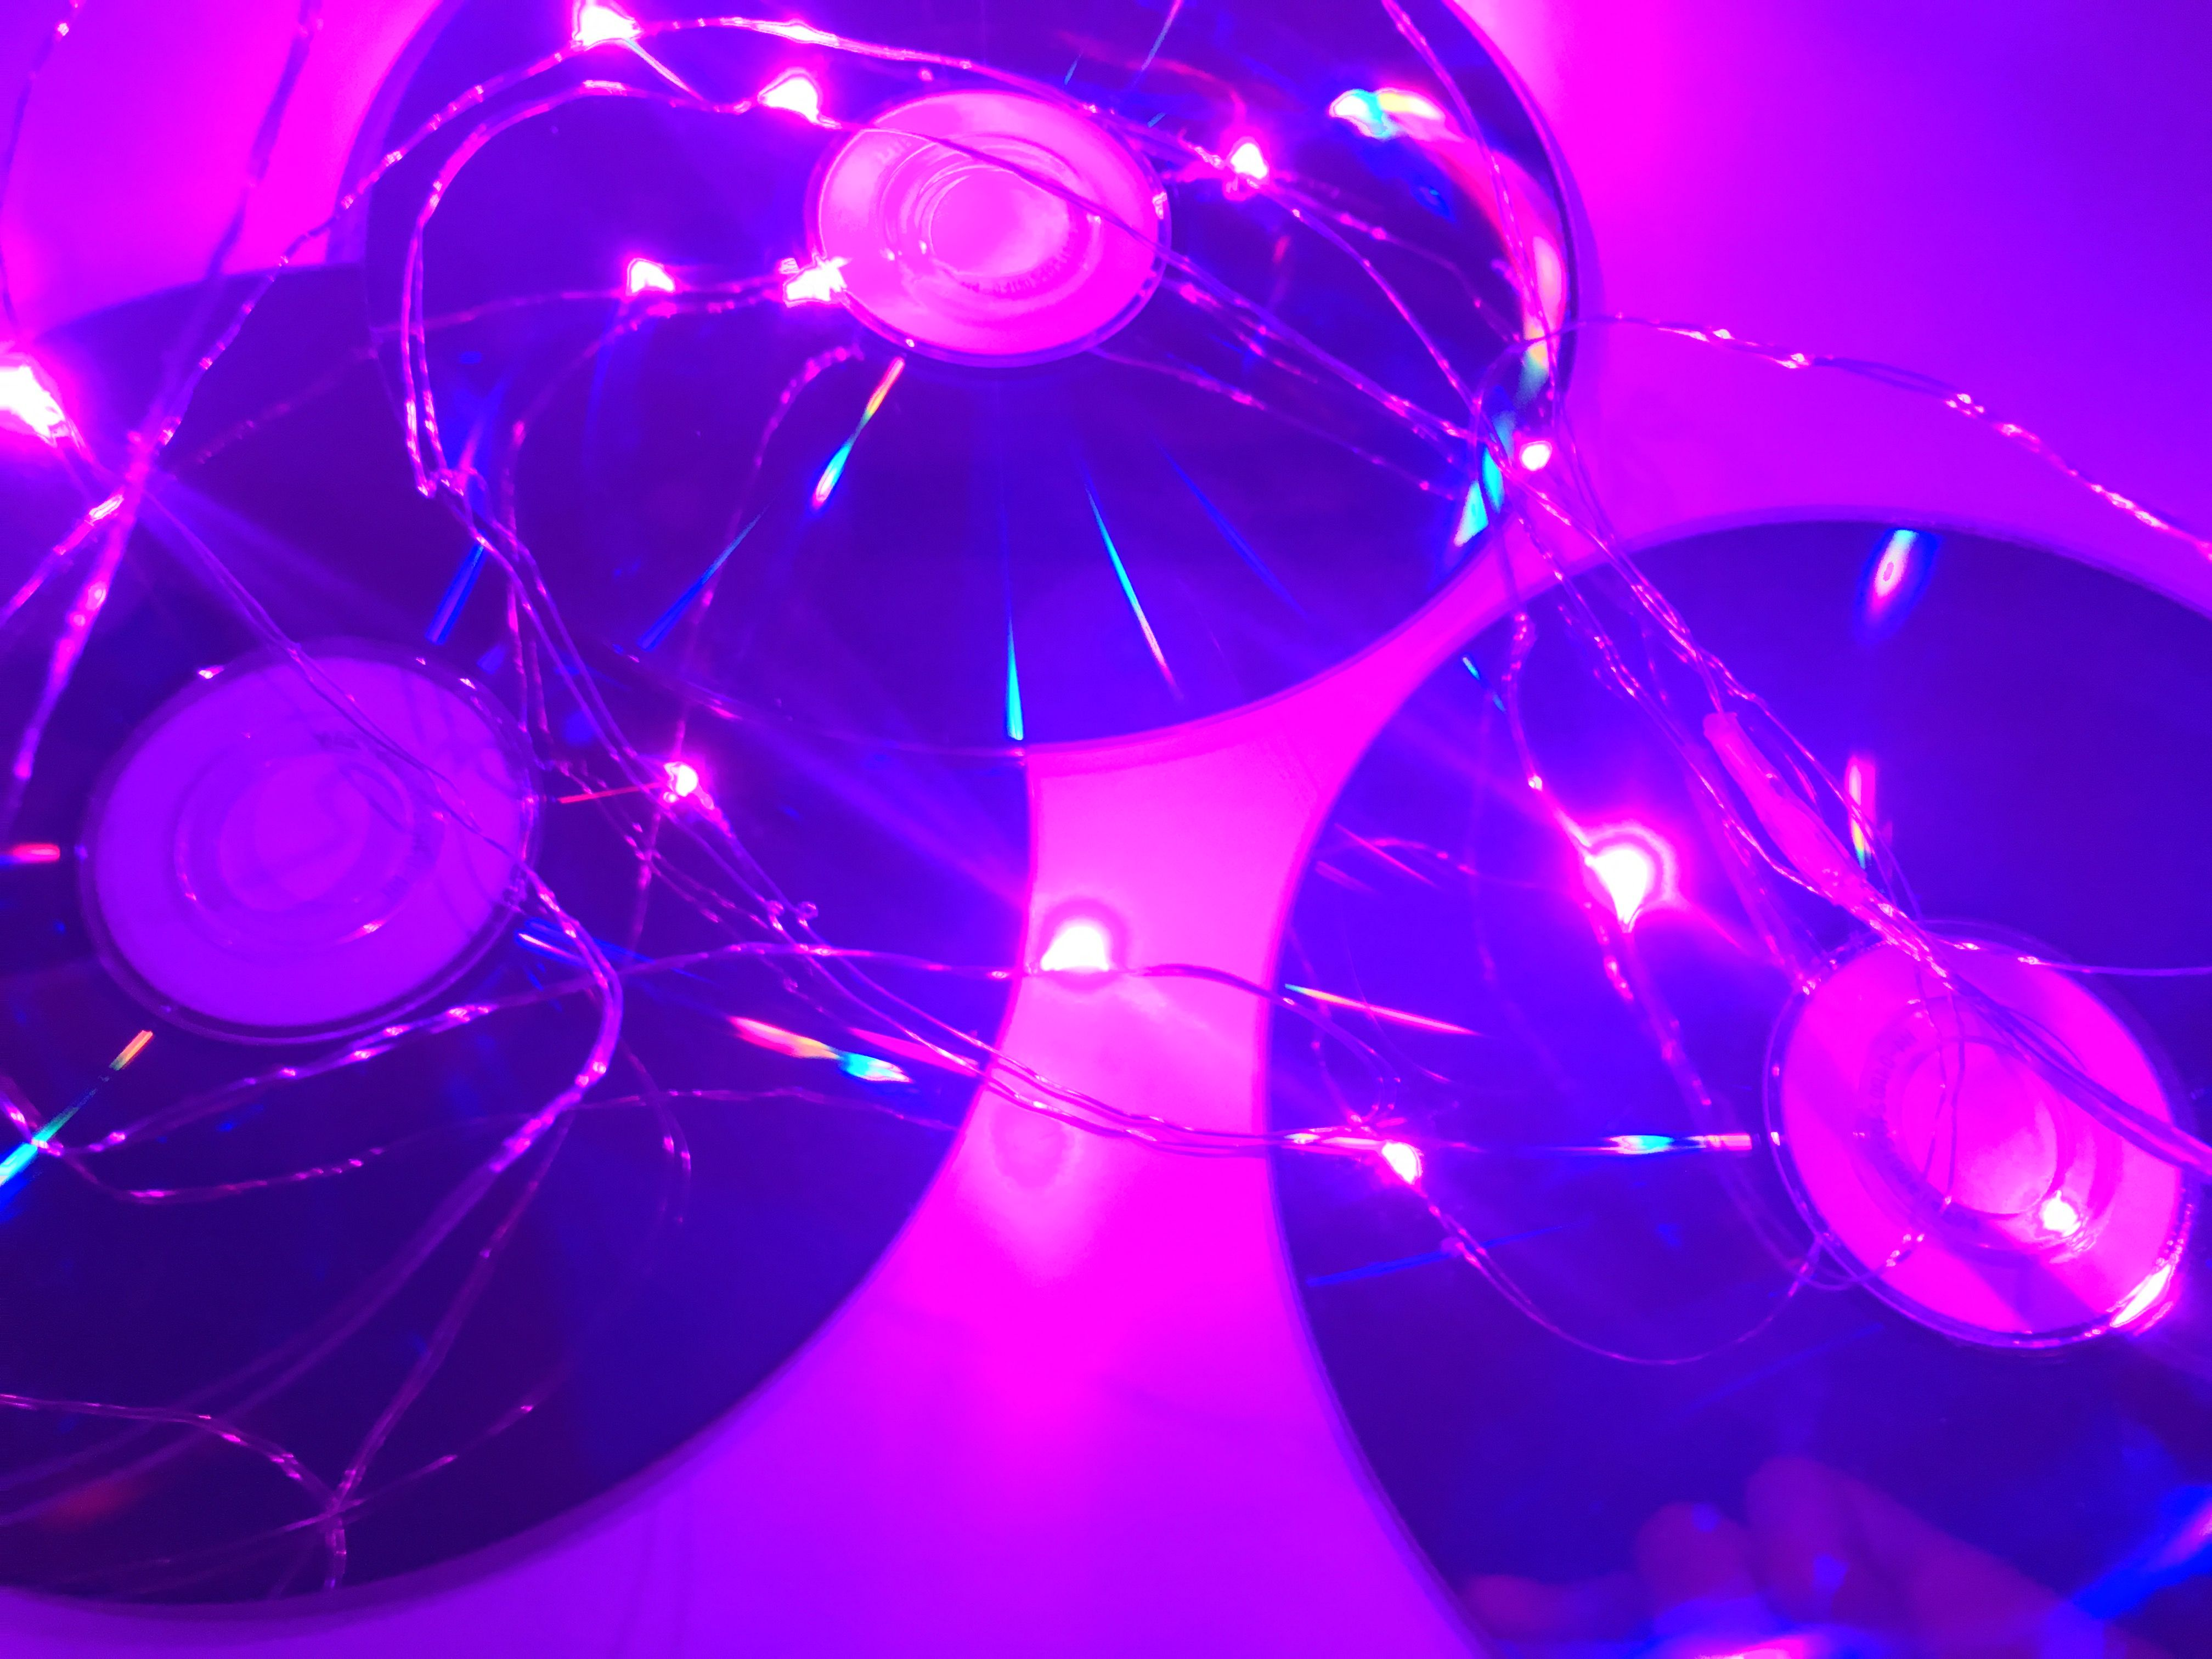 purple aesthetic Purple aesthetic, Neon aesthetic, Aesthetic